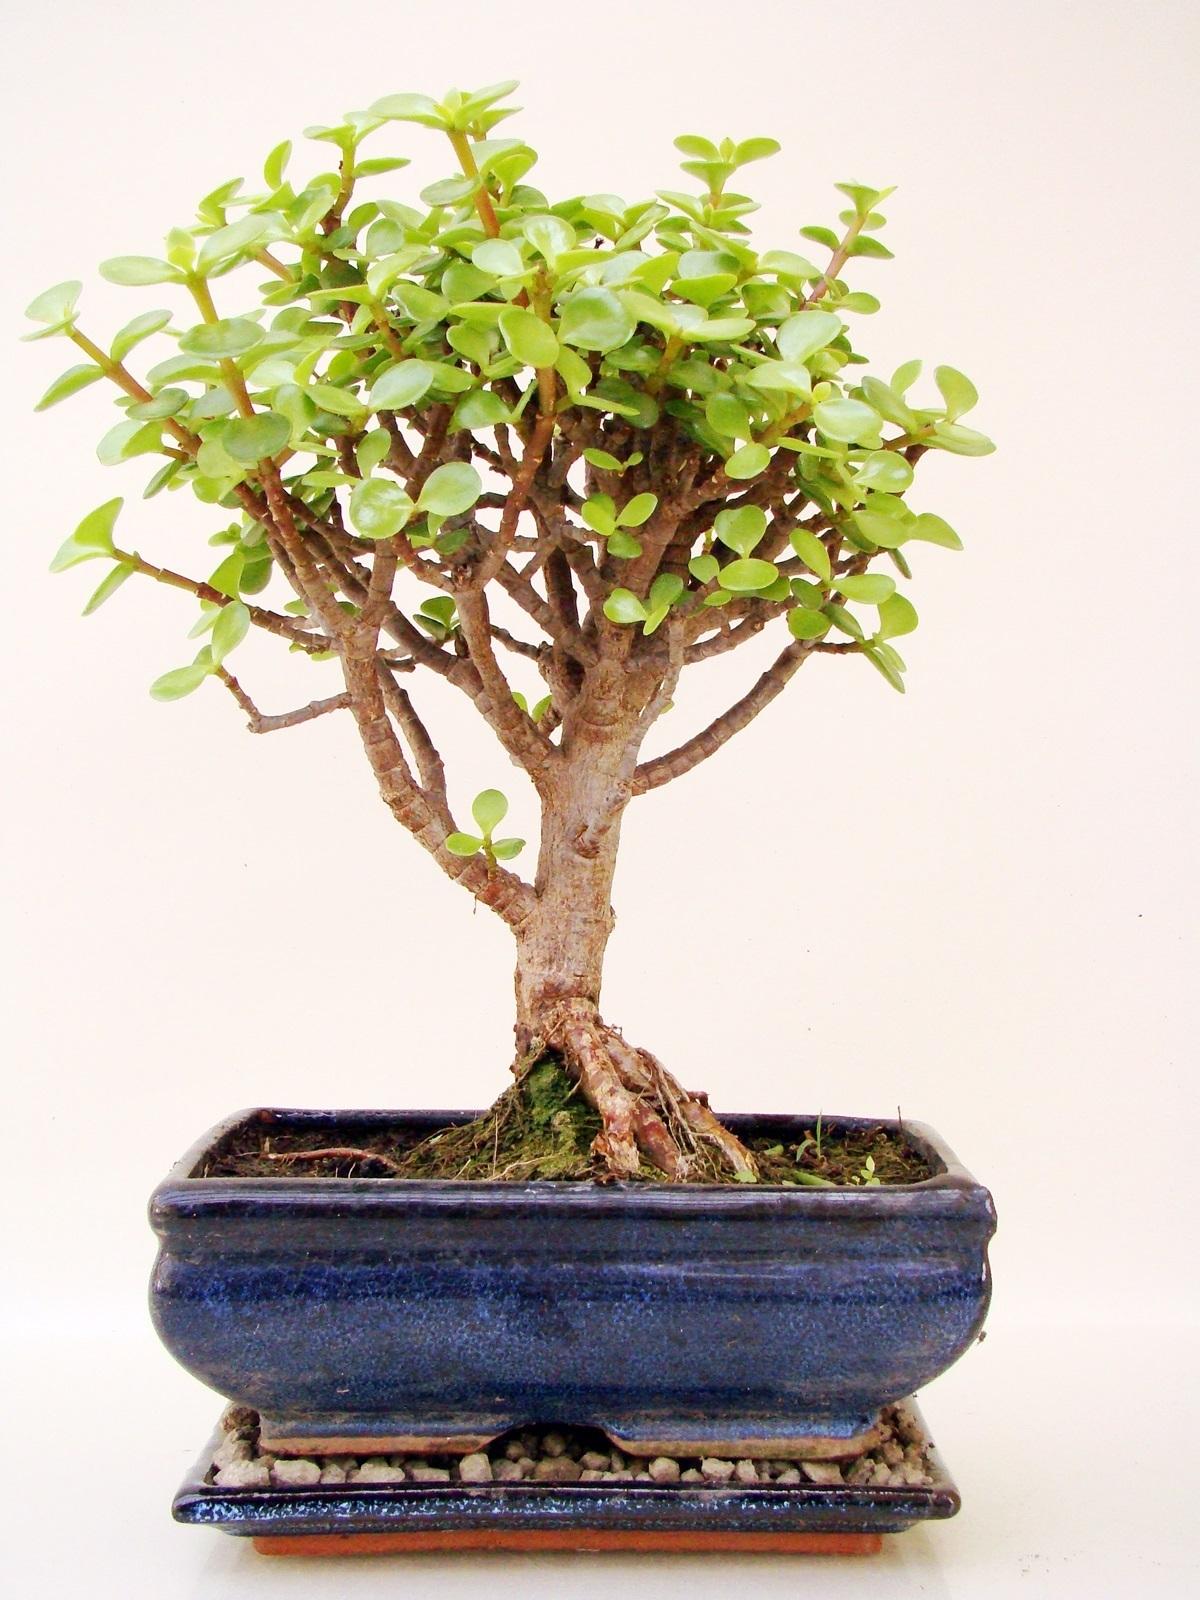 crassula geldbaum cr9 9 genki bonsai. Black Bedroom Furniture Sets. Home Design Ideas